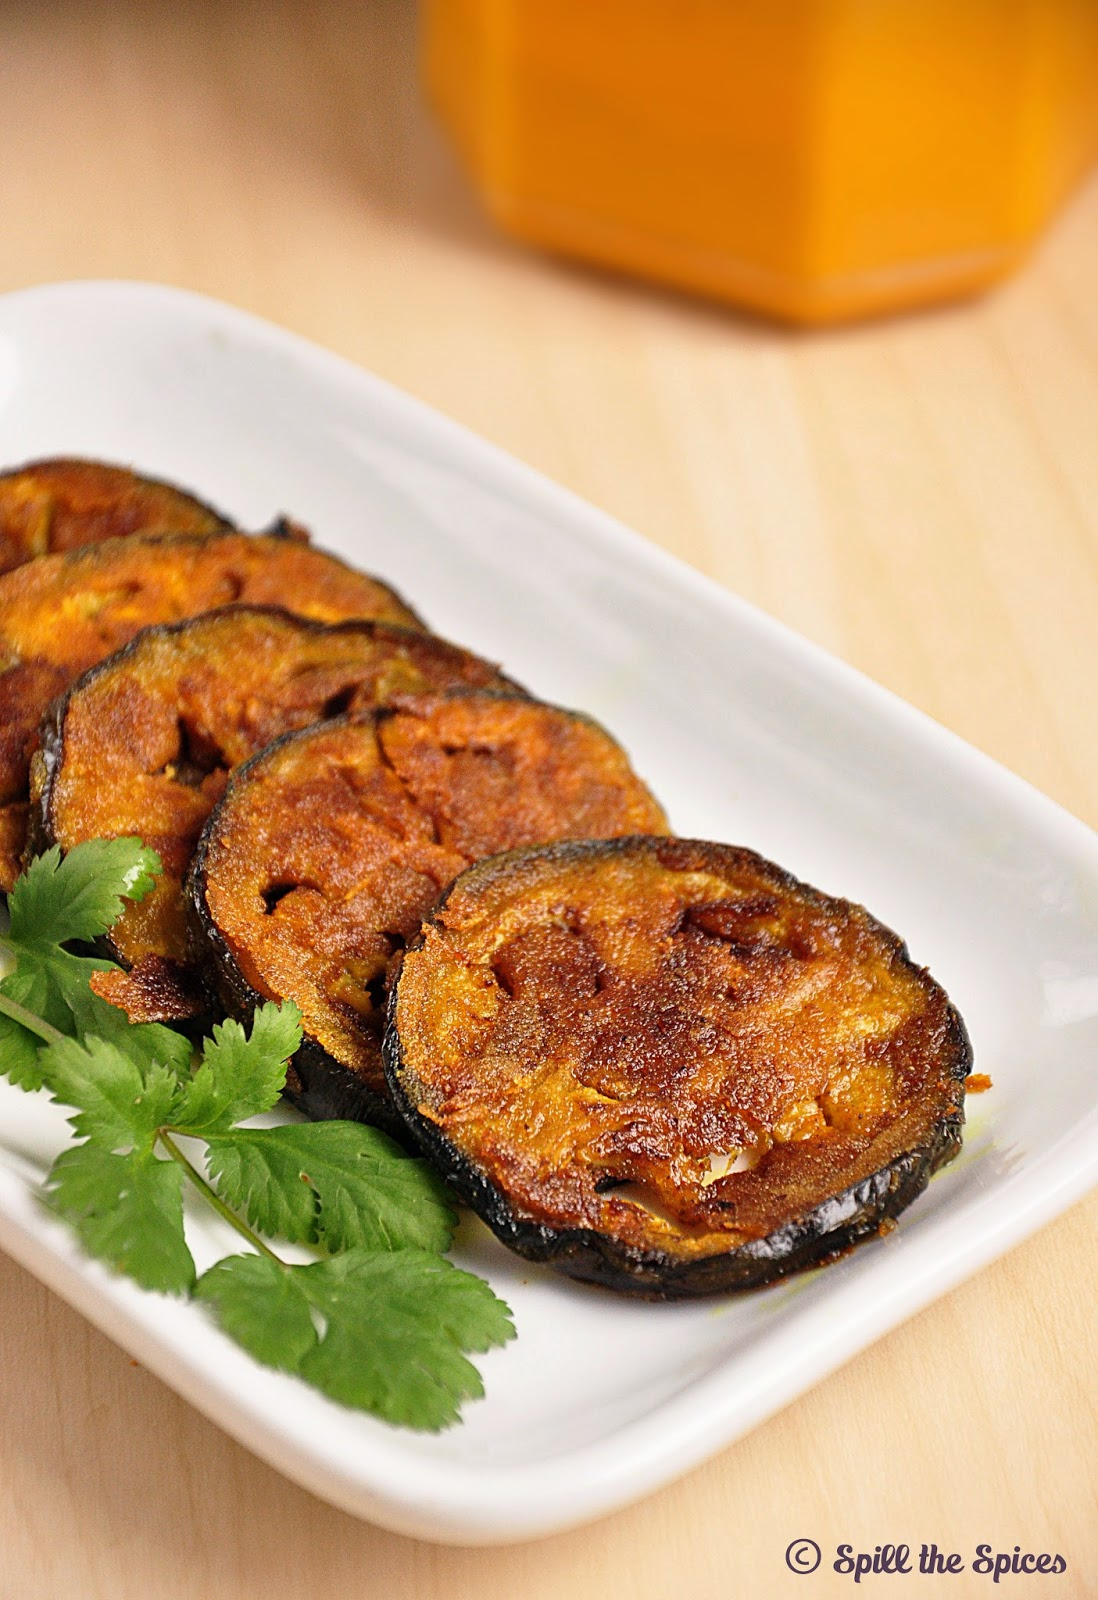 Begun Bhaja | Bengali Eggplant Fry | Spill the Spices